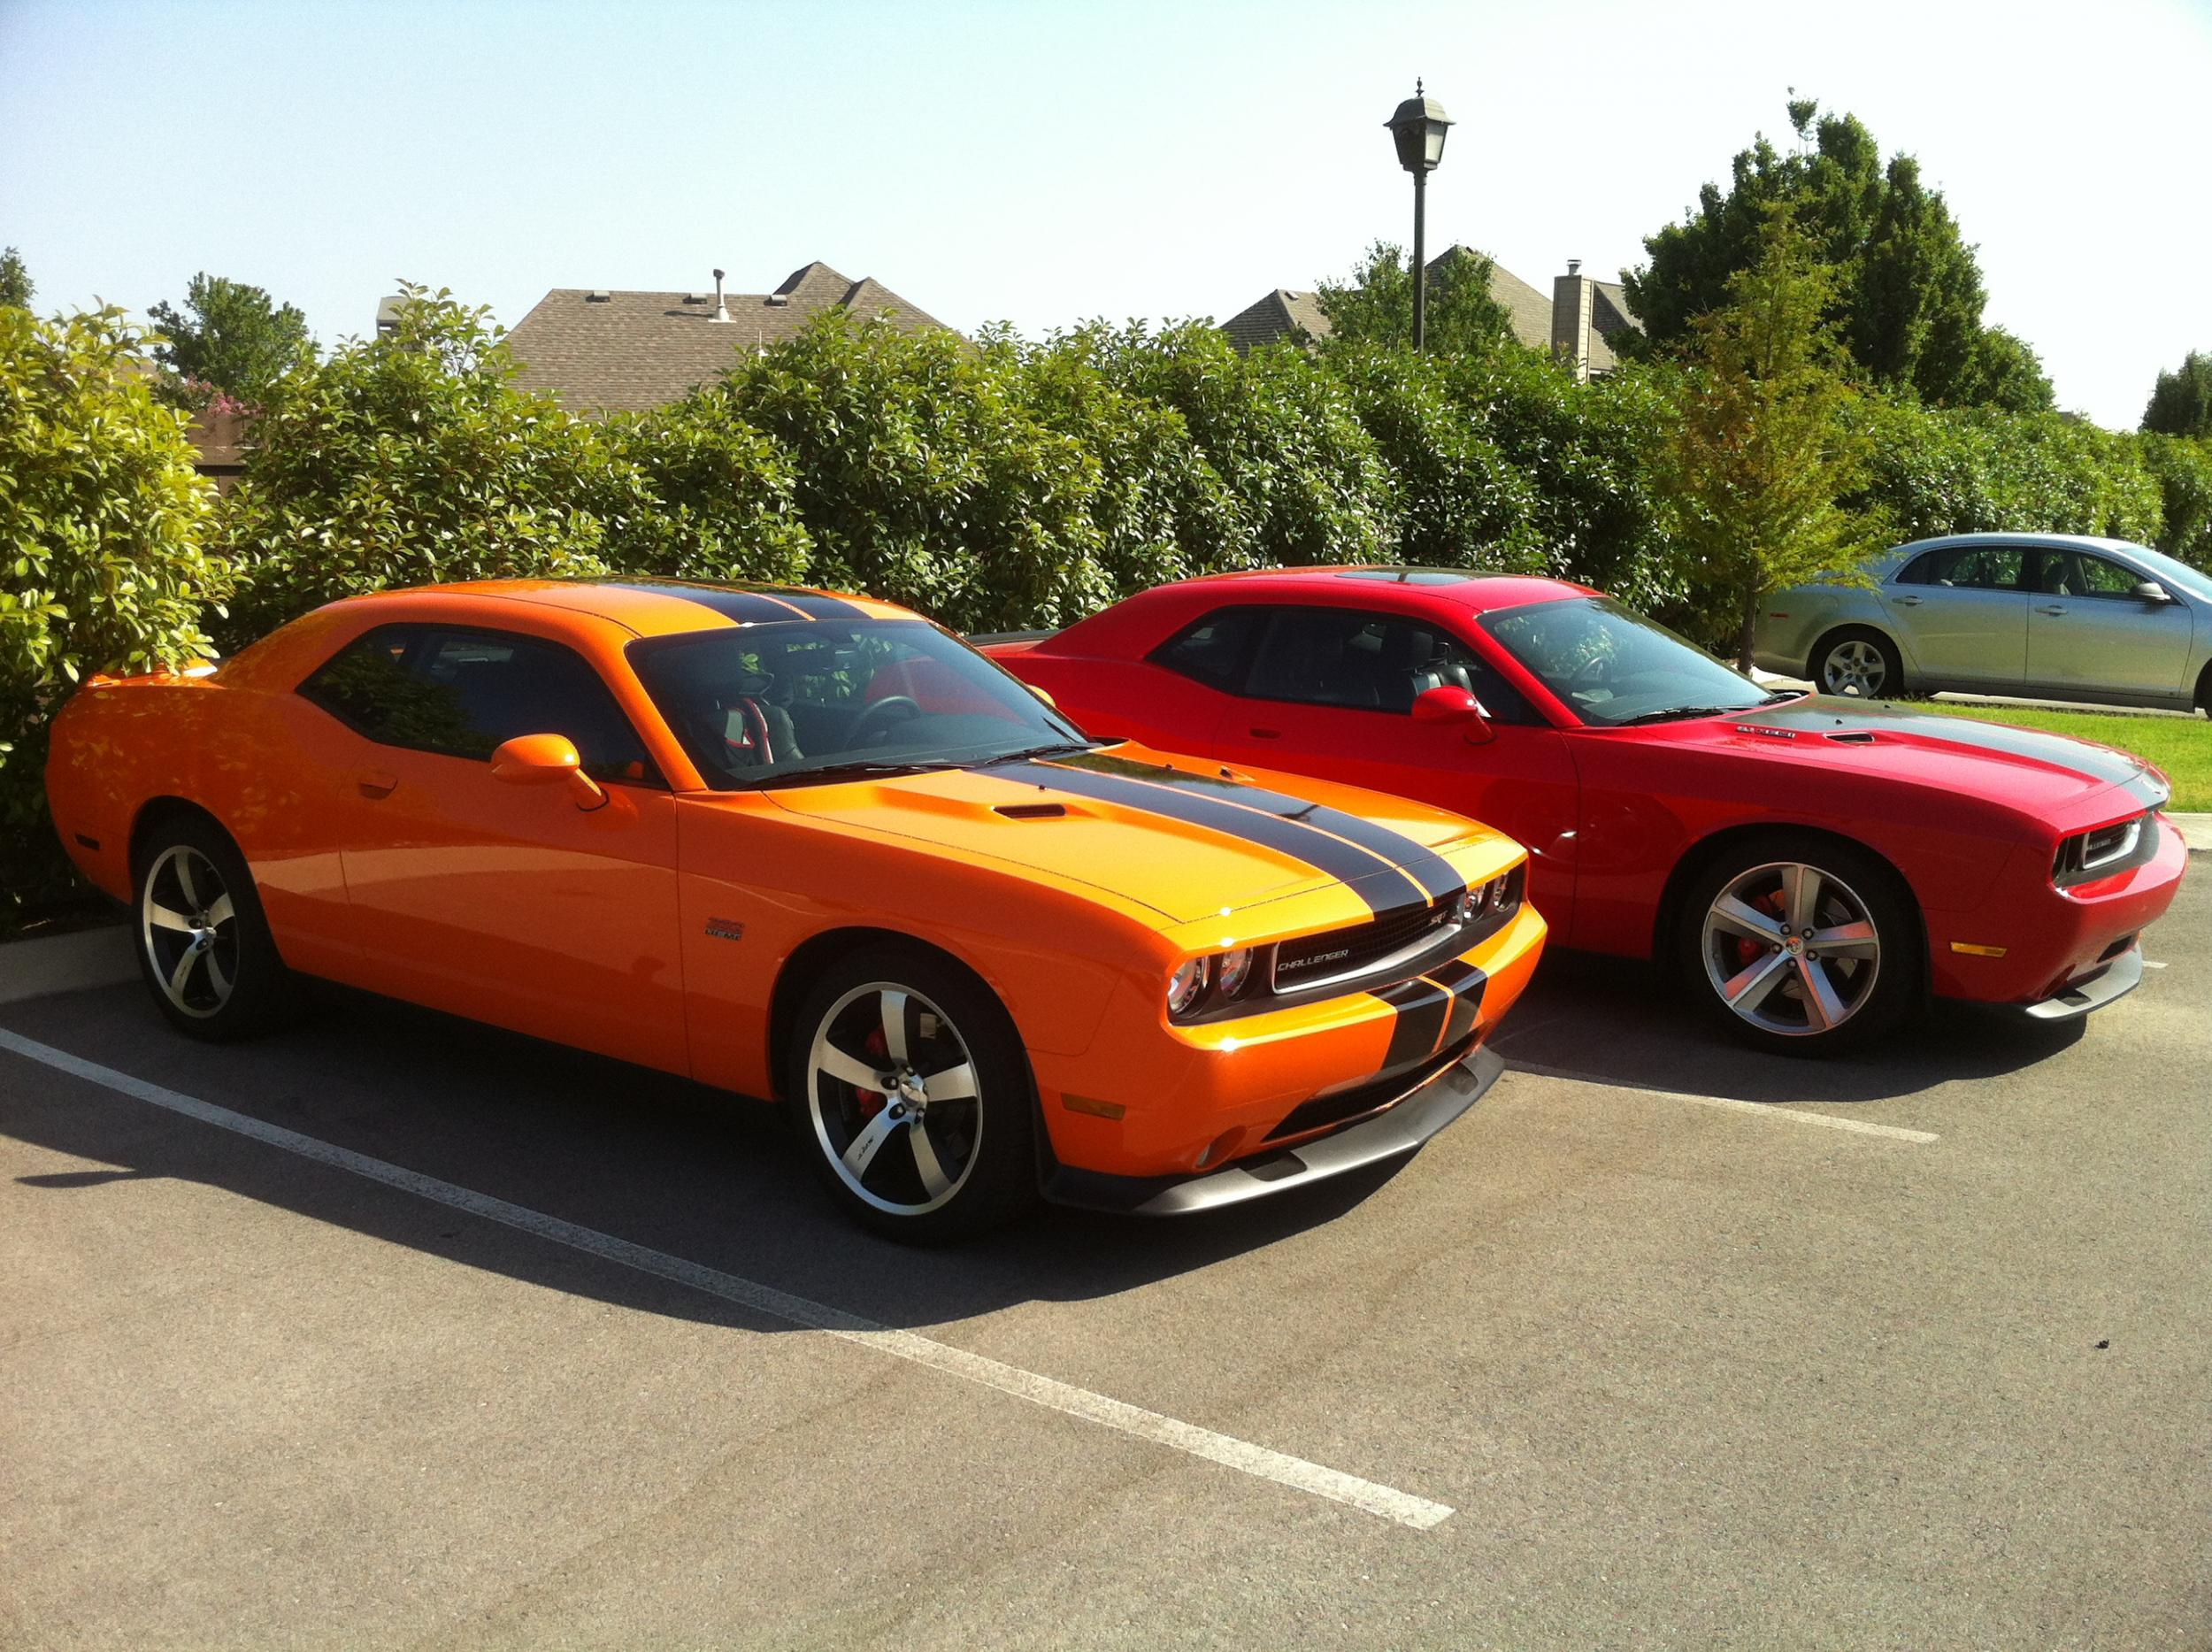 Hemi and Header Orange Challengers-050.jpg